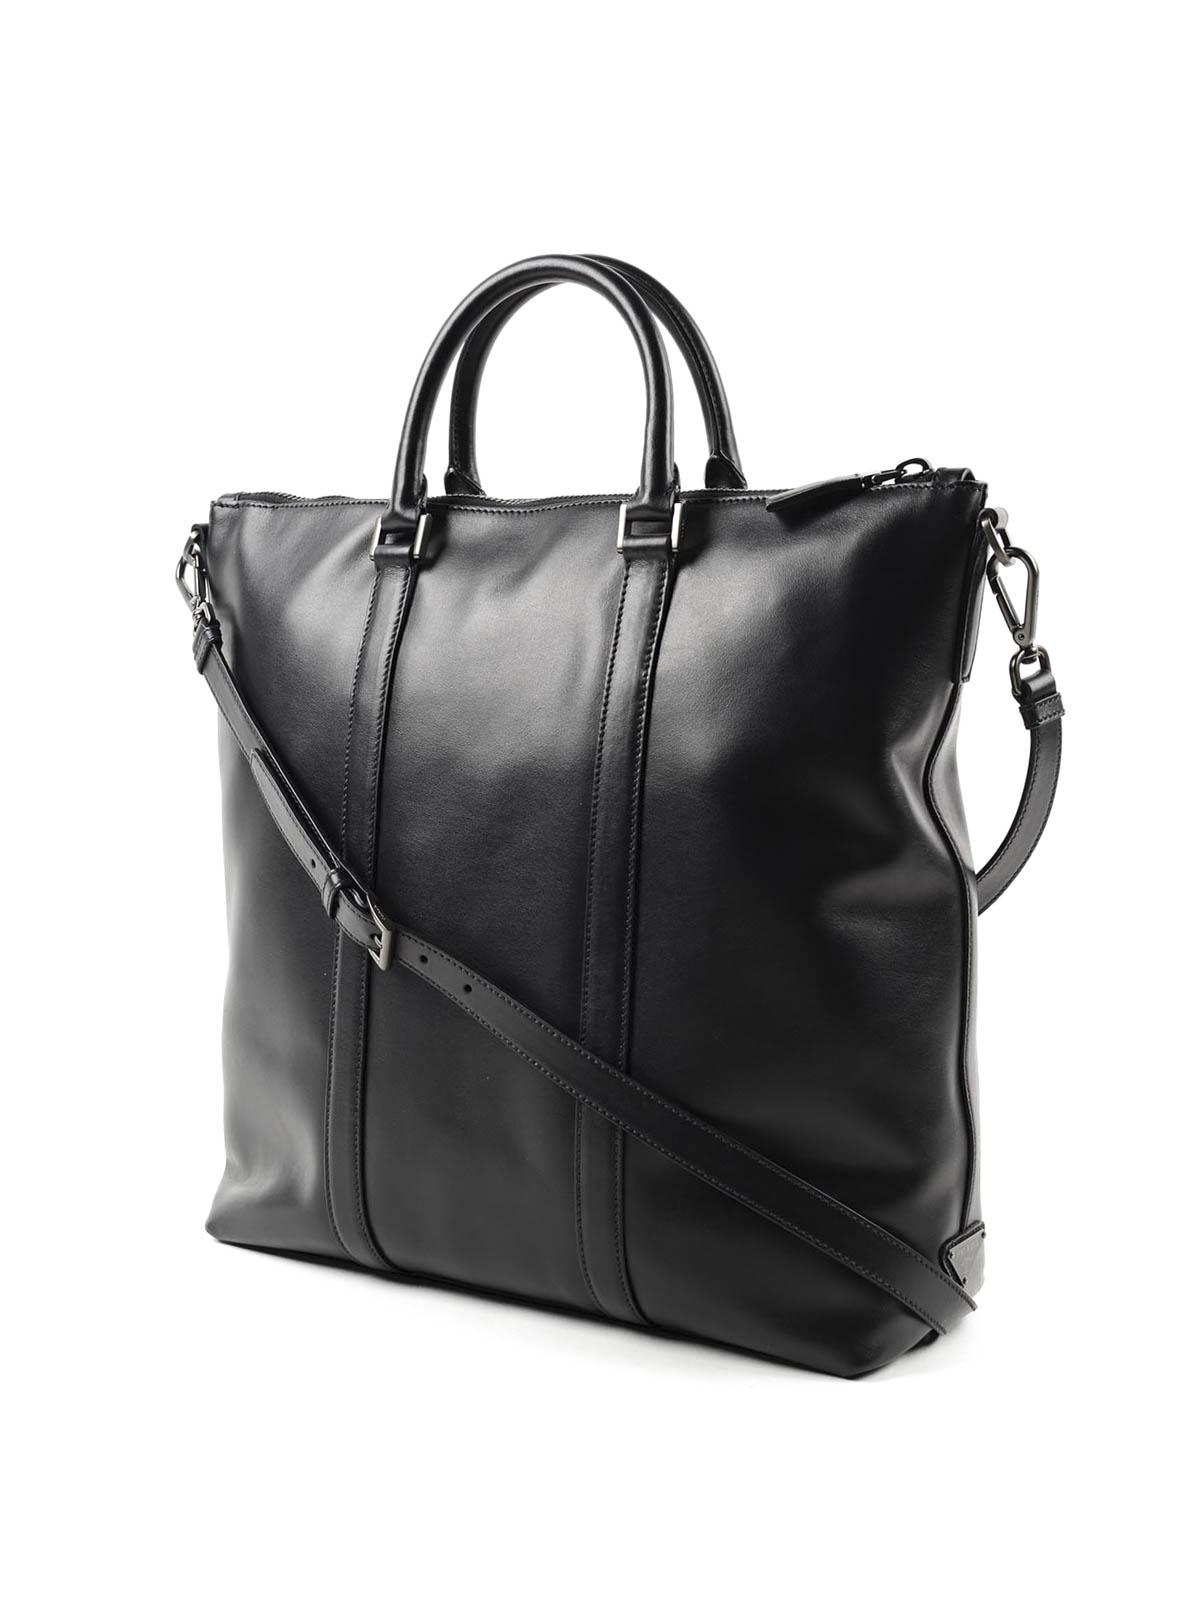 Soft leather travel bag by Prada - Luggage \u0026amp; Travel bags | iKRIX